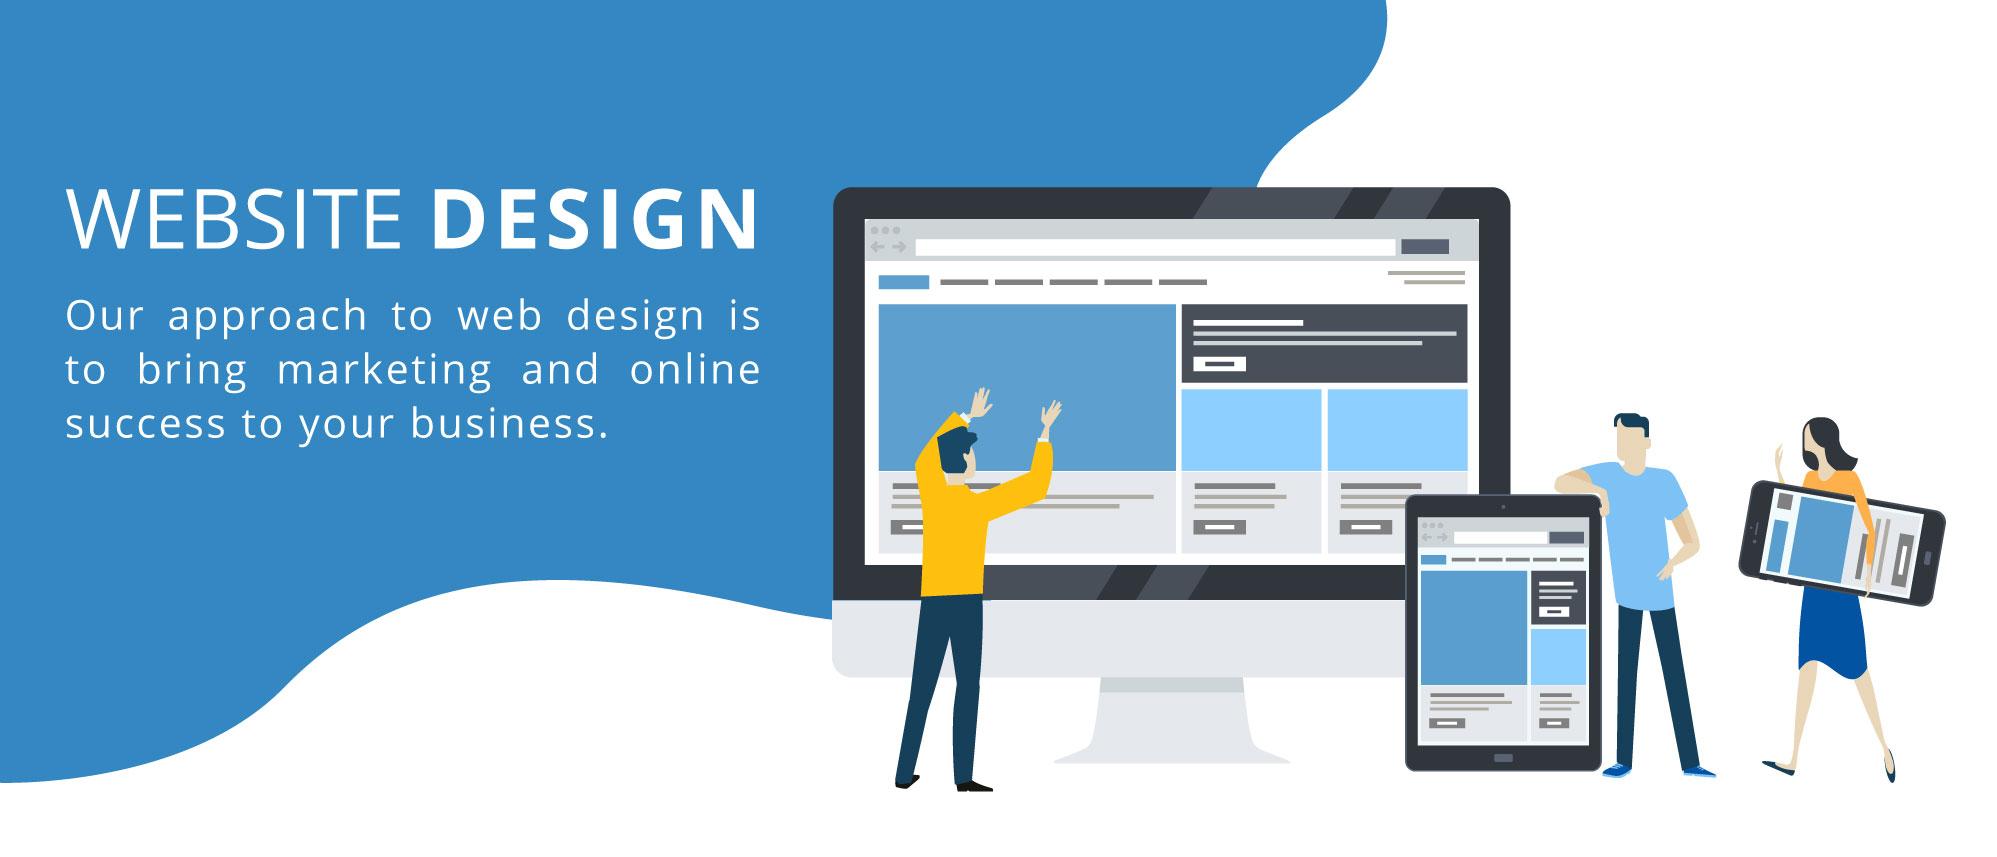 Web Design And Web Development, Web Design & Web Development, Web Design And Web Development, Web Design & Web Development Lebanon Beirut, Web Design And Web Development, Web Design & Web Development In Lebanon Beirut